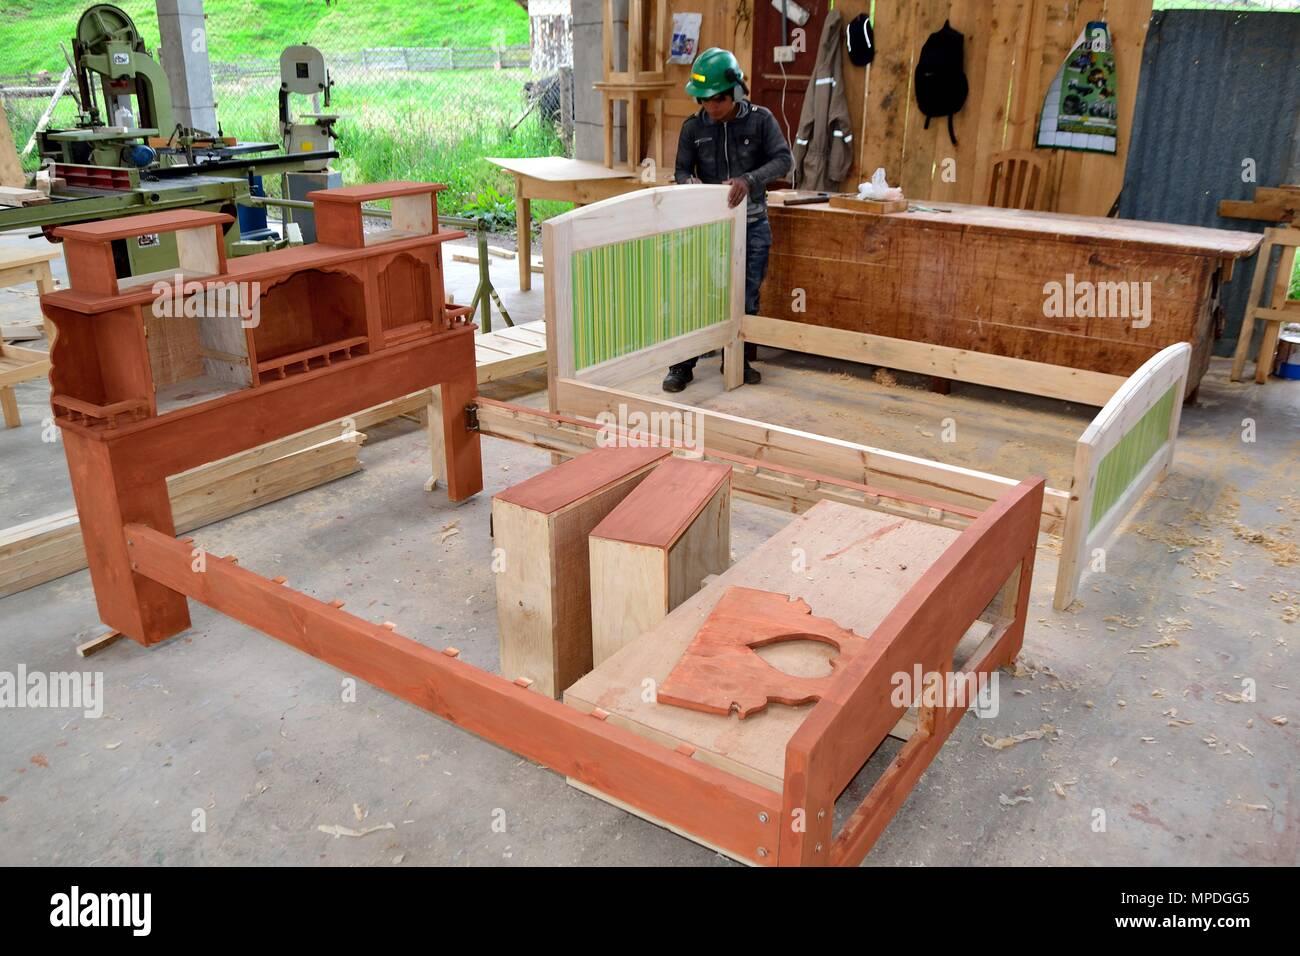 Manufacture Of Furniture   Sawmill In GRANJA PORCON   Evangelical  Cooperative . Department Of Cajamarca .PERU